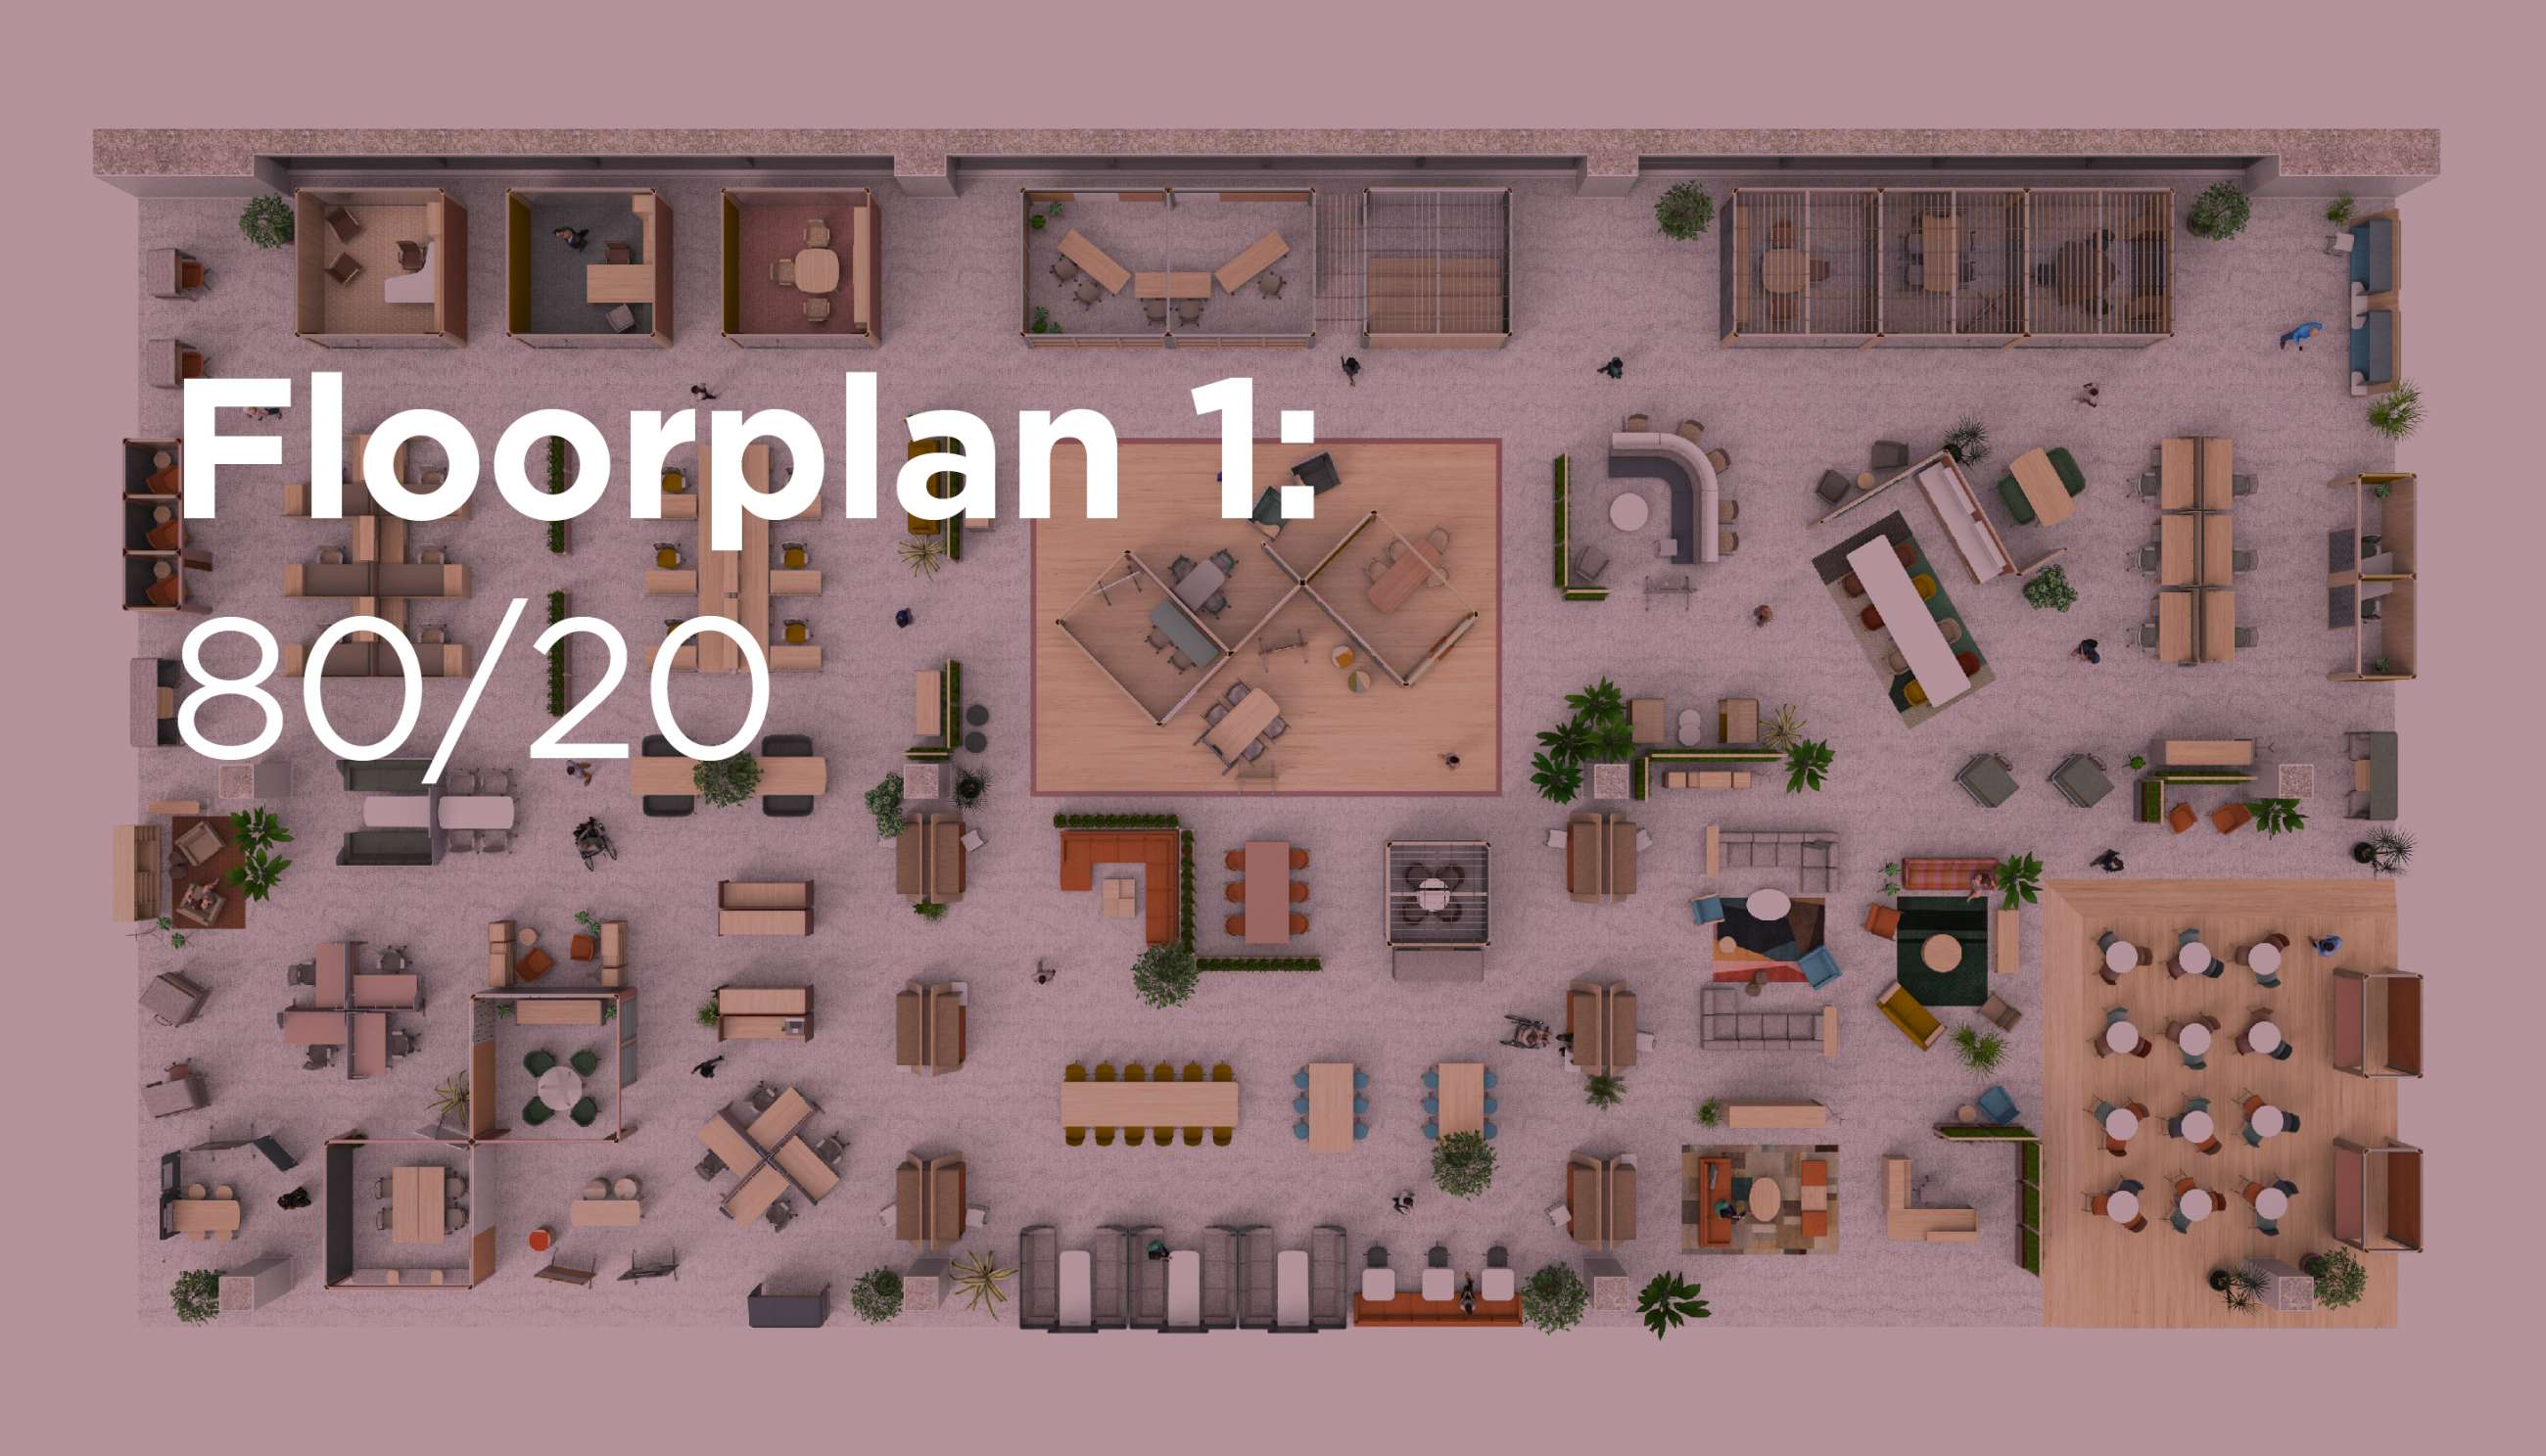 Floorplan 1: 80/20